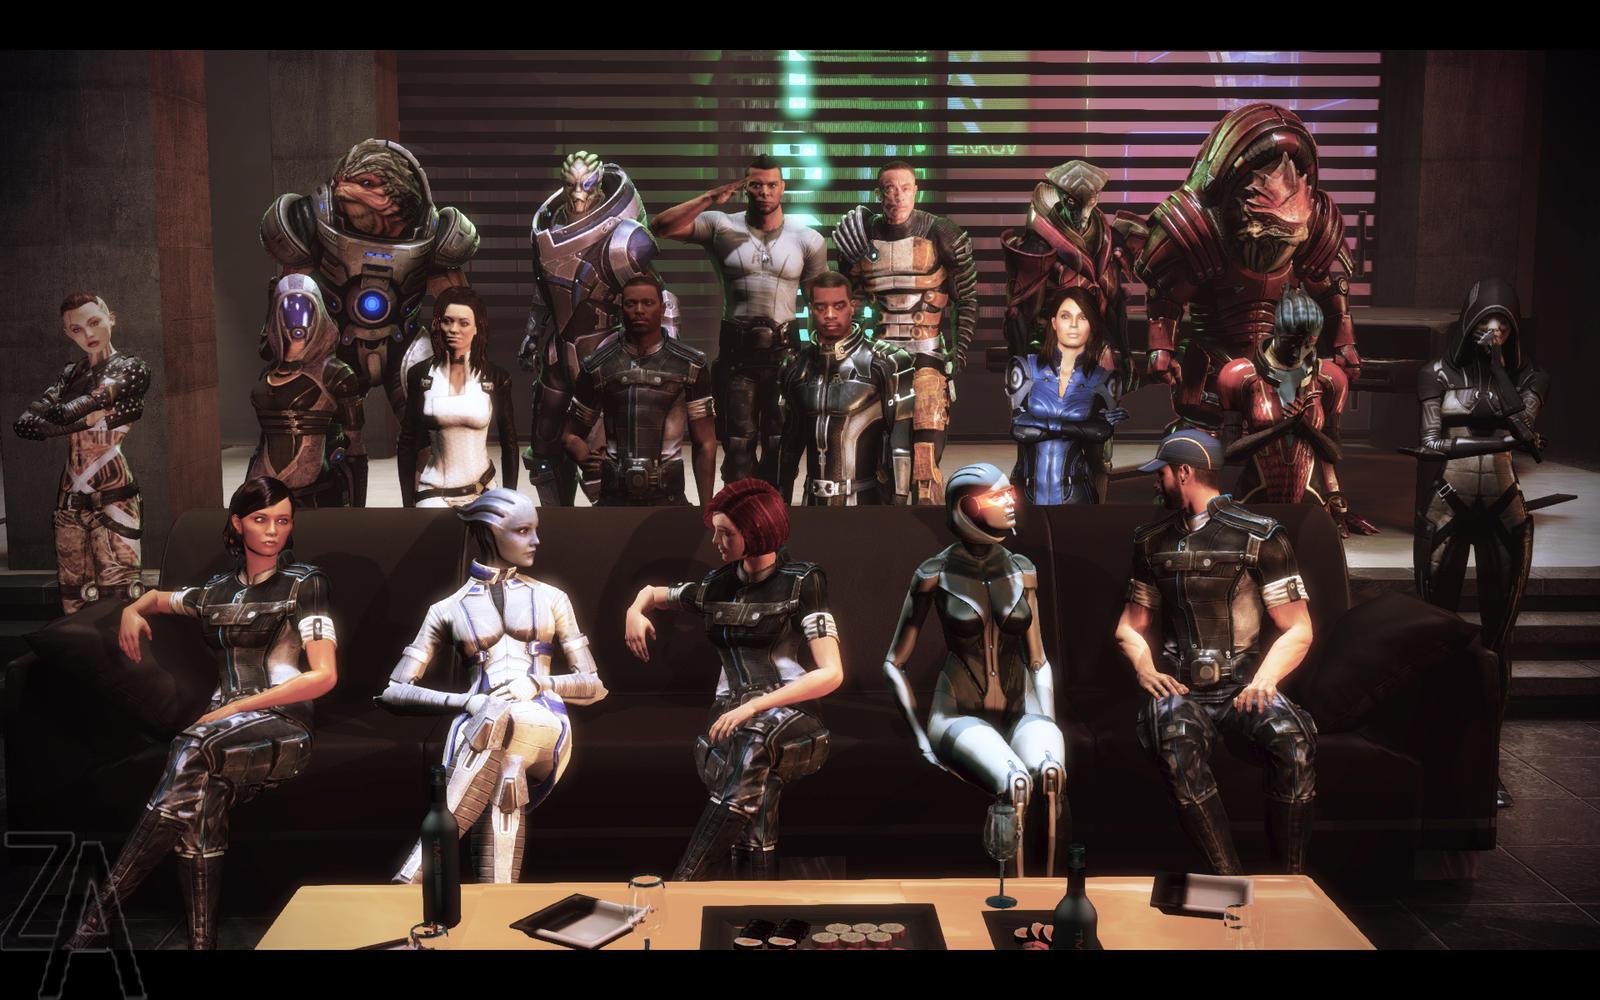 The DLC Group